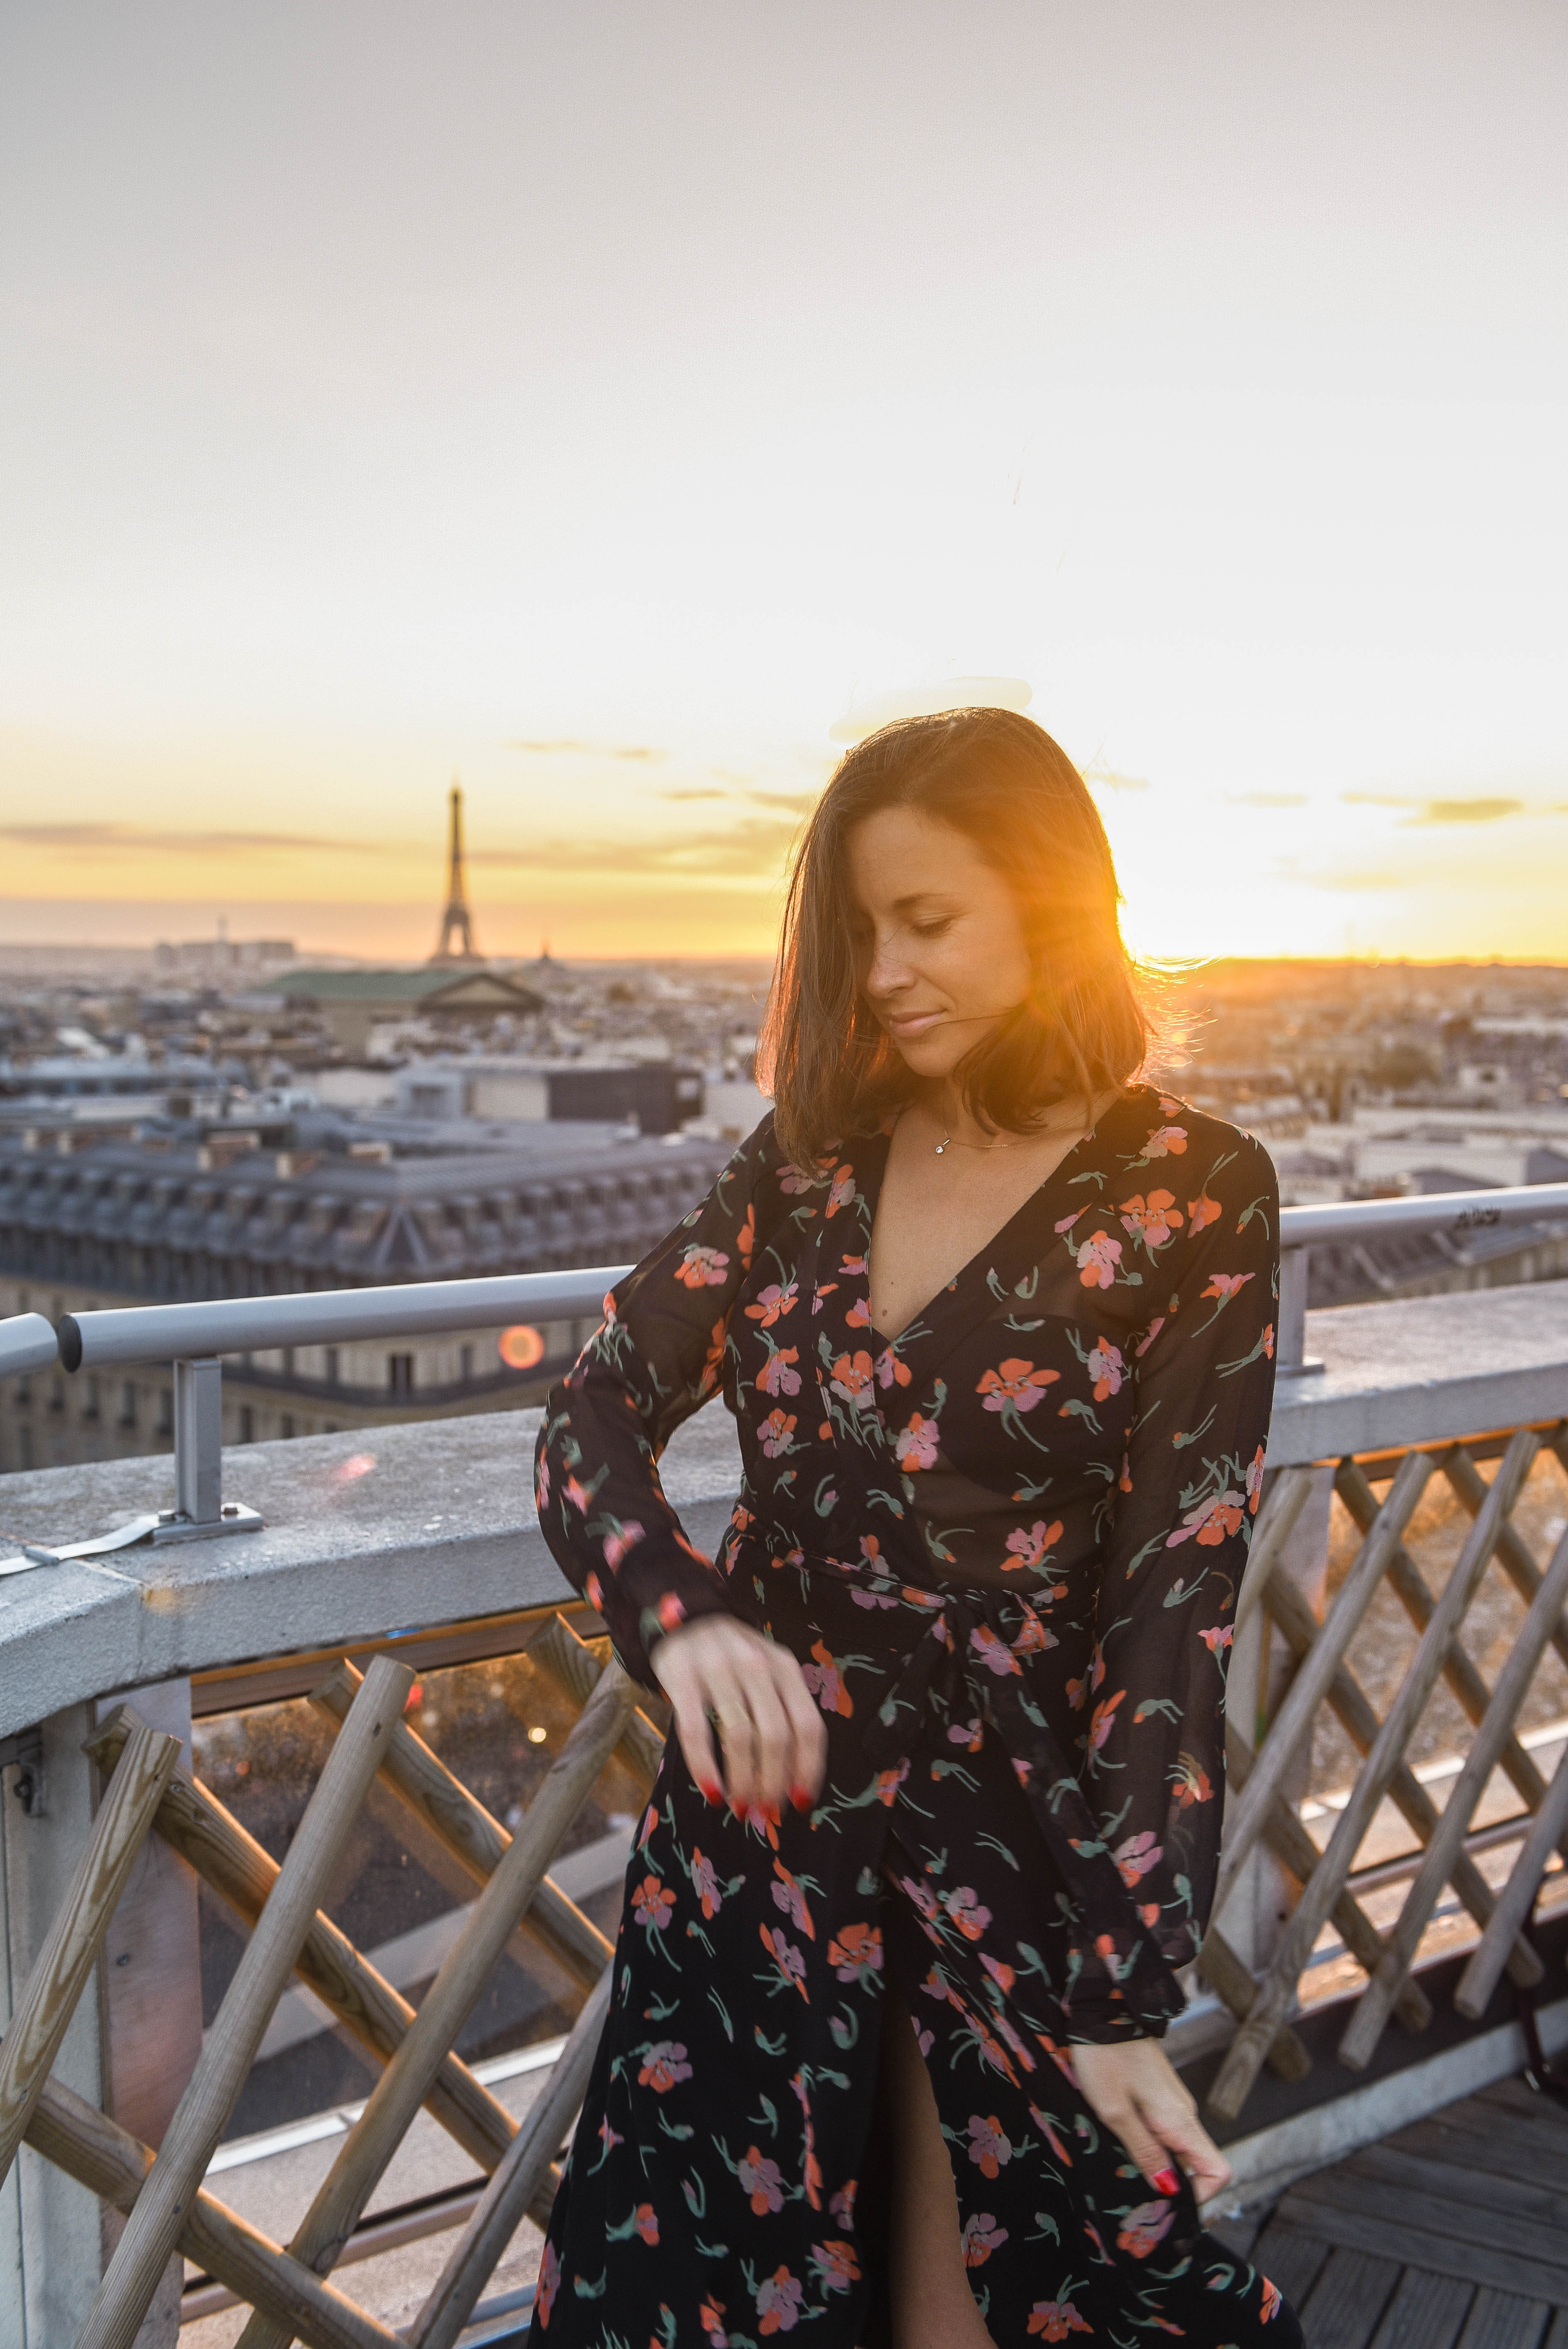 Lulu in Paris with golden light